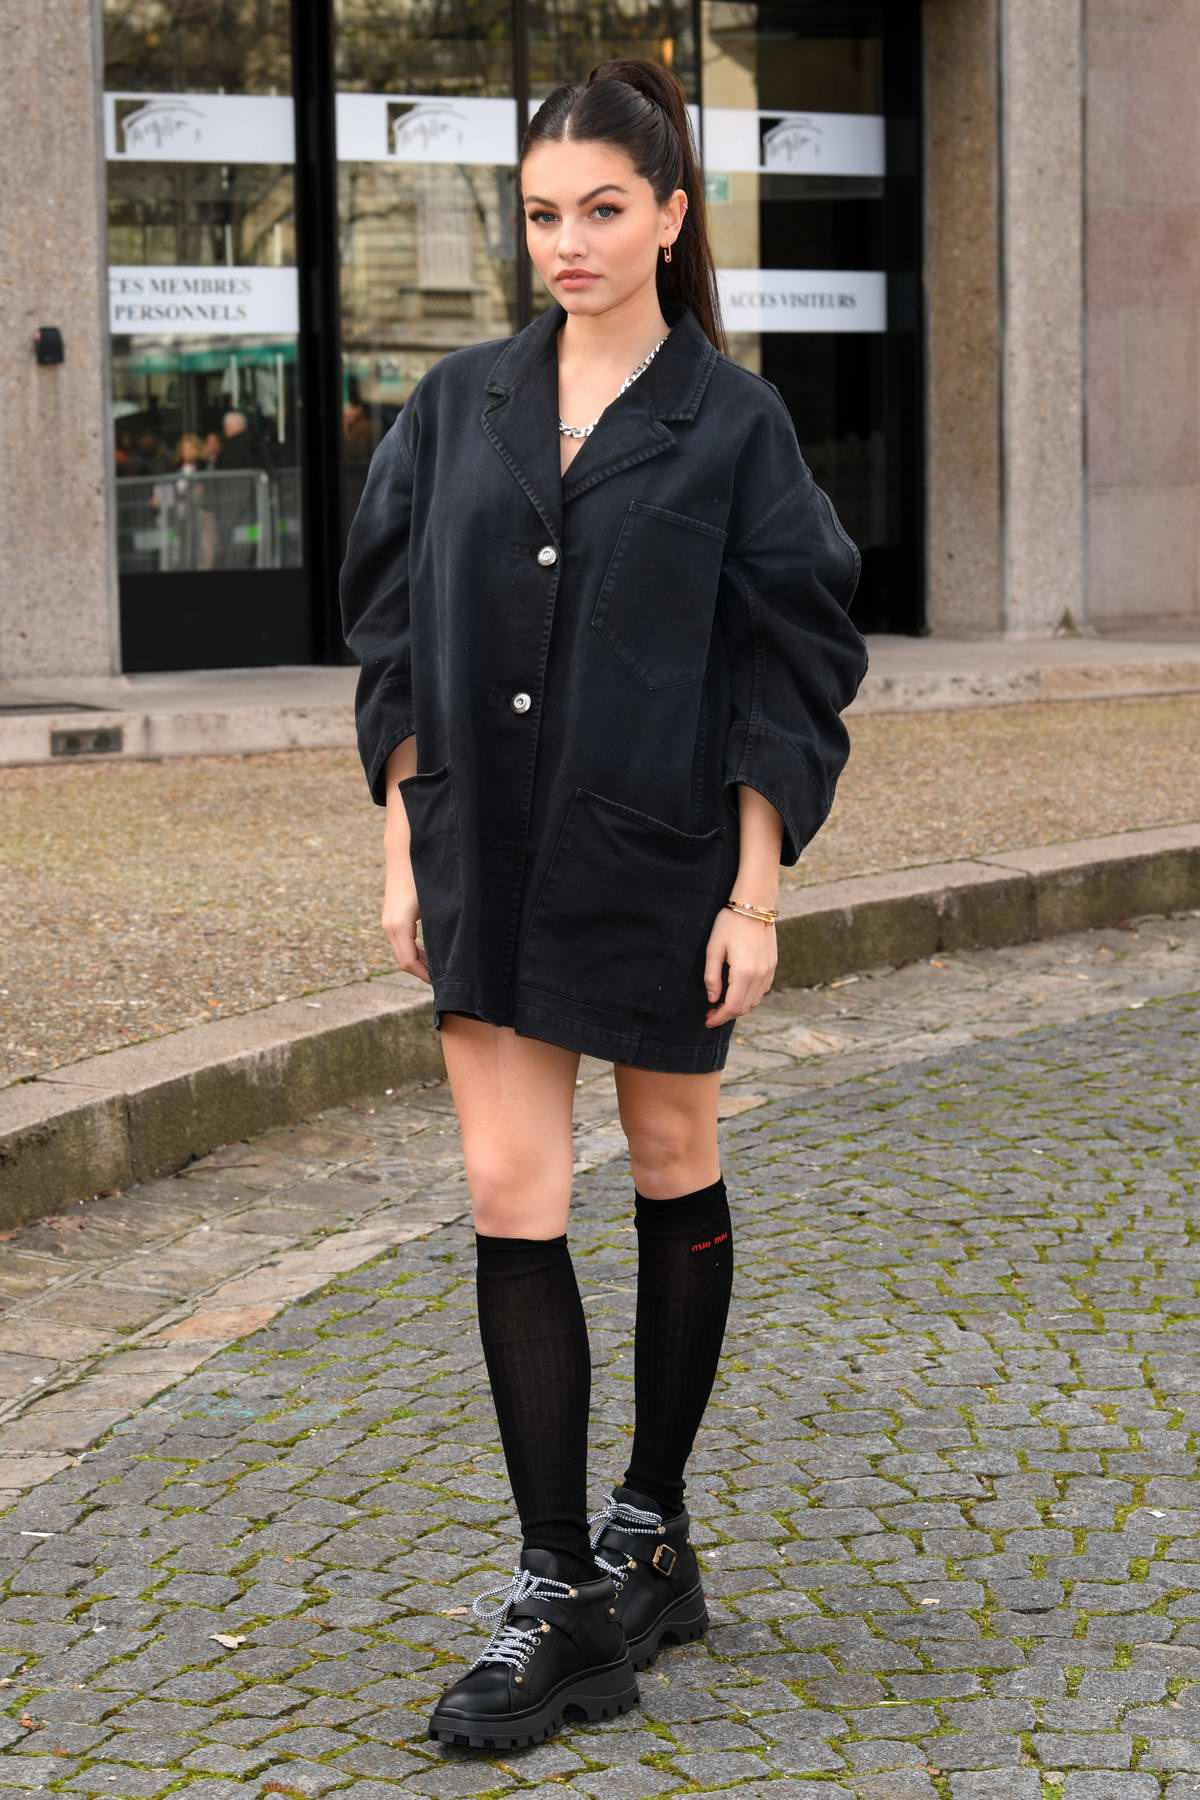 Thylane Blondeau attends the Miu Miu fashion show, F/W 2020 during Paris Fashion Week in Paris, France